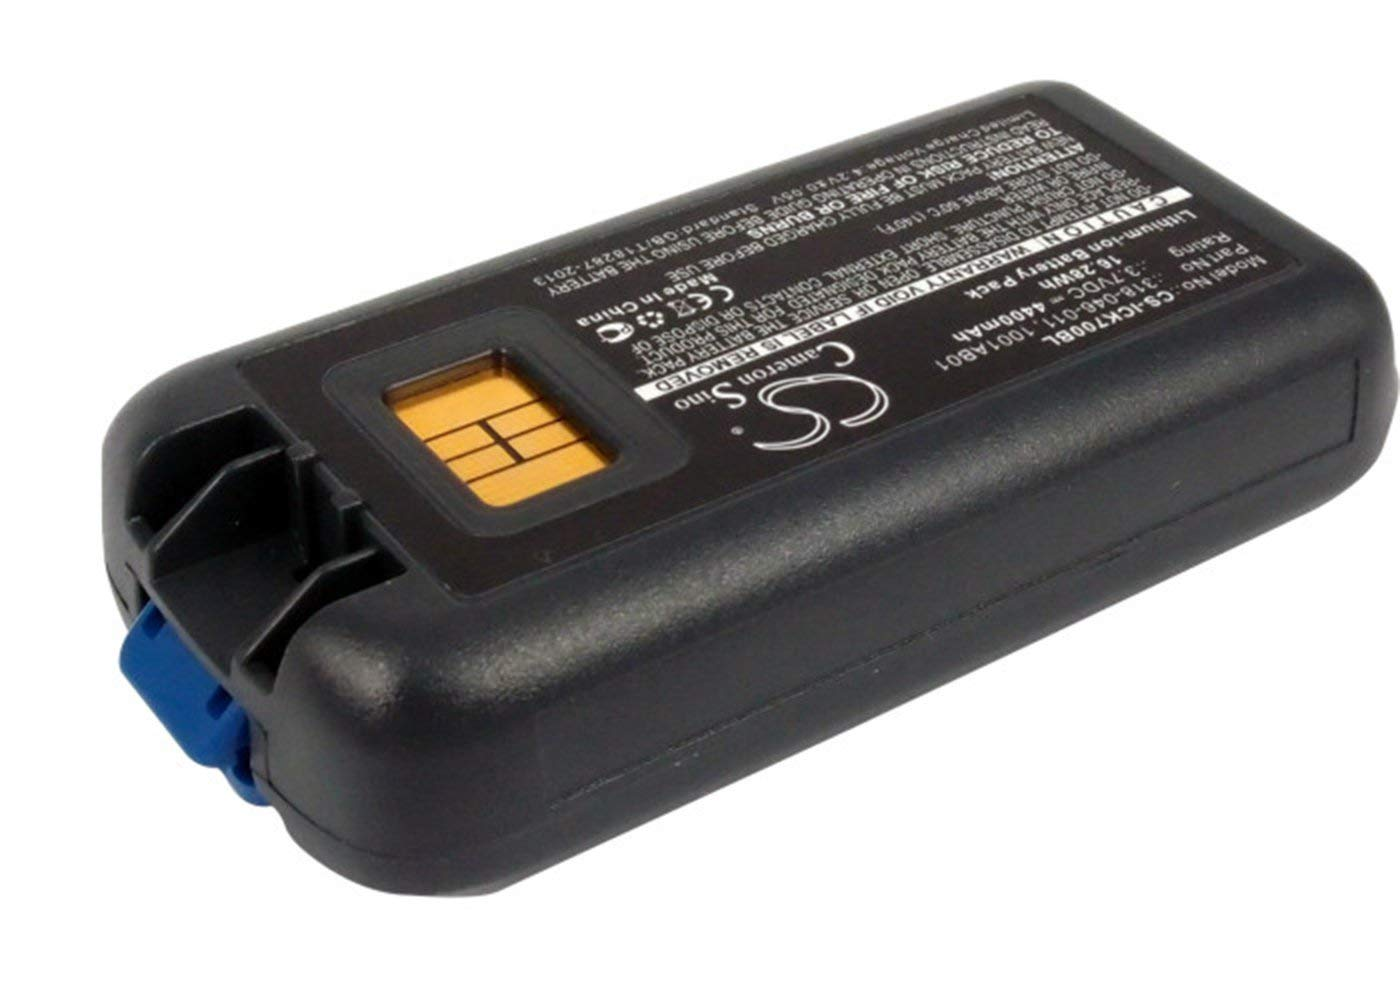 VINTRONS, INTERMEC 1001AB01, 1001AB02, 318-046-001, 318-046-011 Replacement Battery for INTERMEC CK70, CK71, by VI VINTRONS (Image #2)